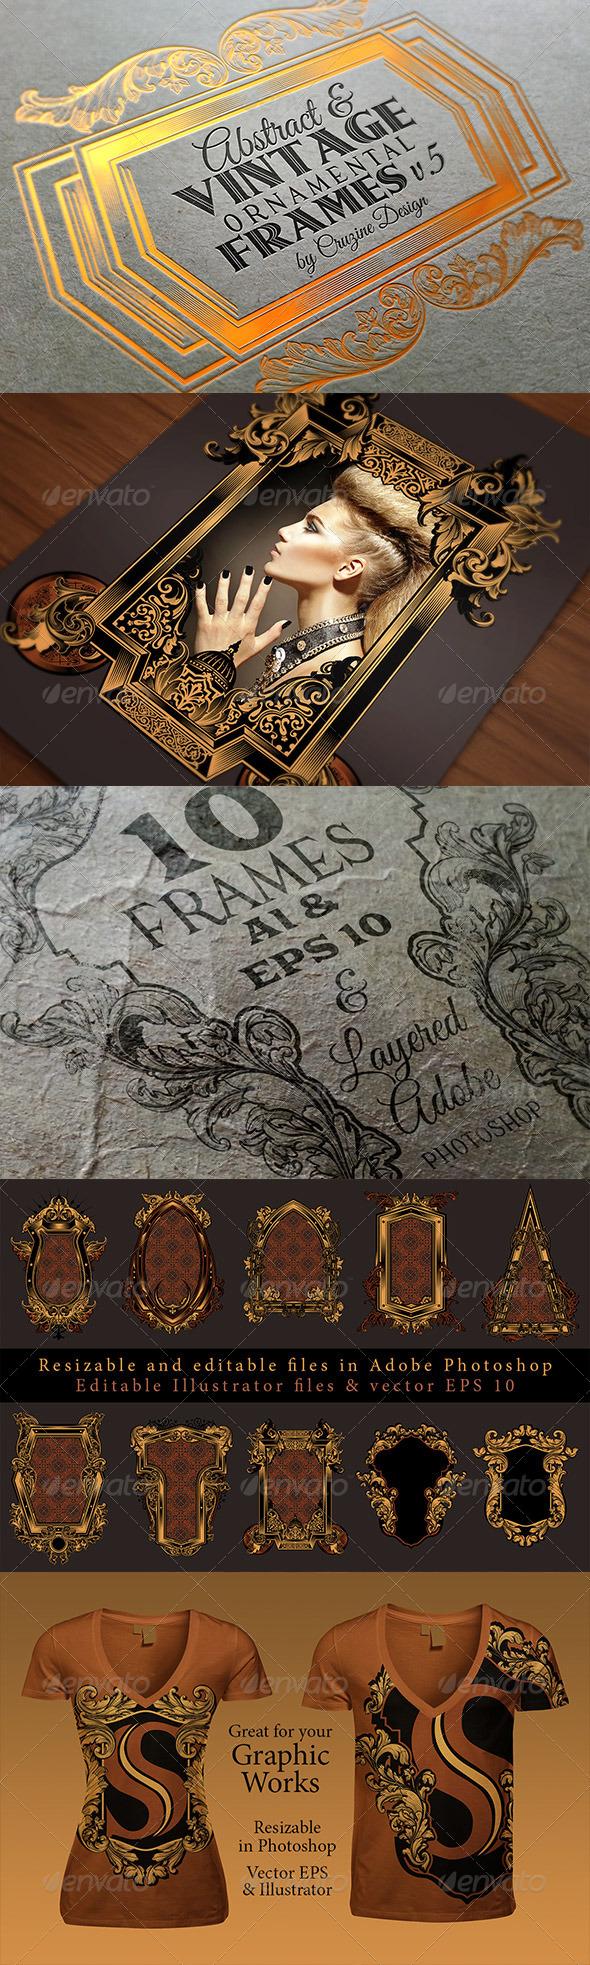 10 Frames Vol.5 - Vintage Ornament - Graphics